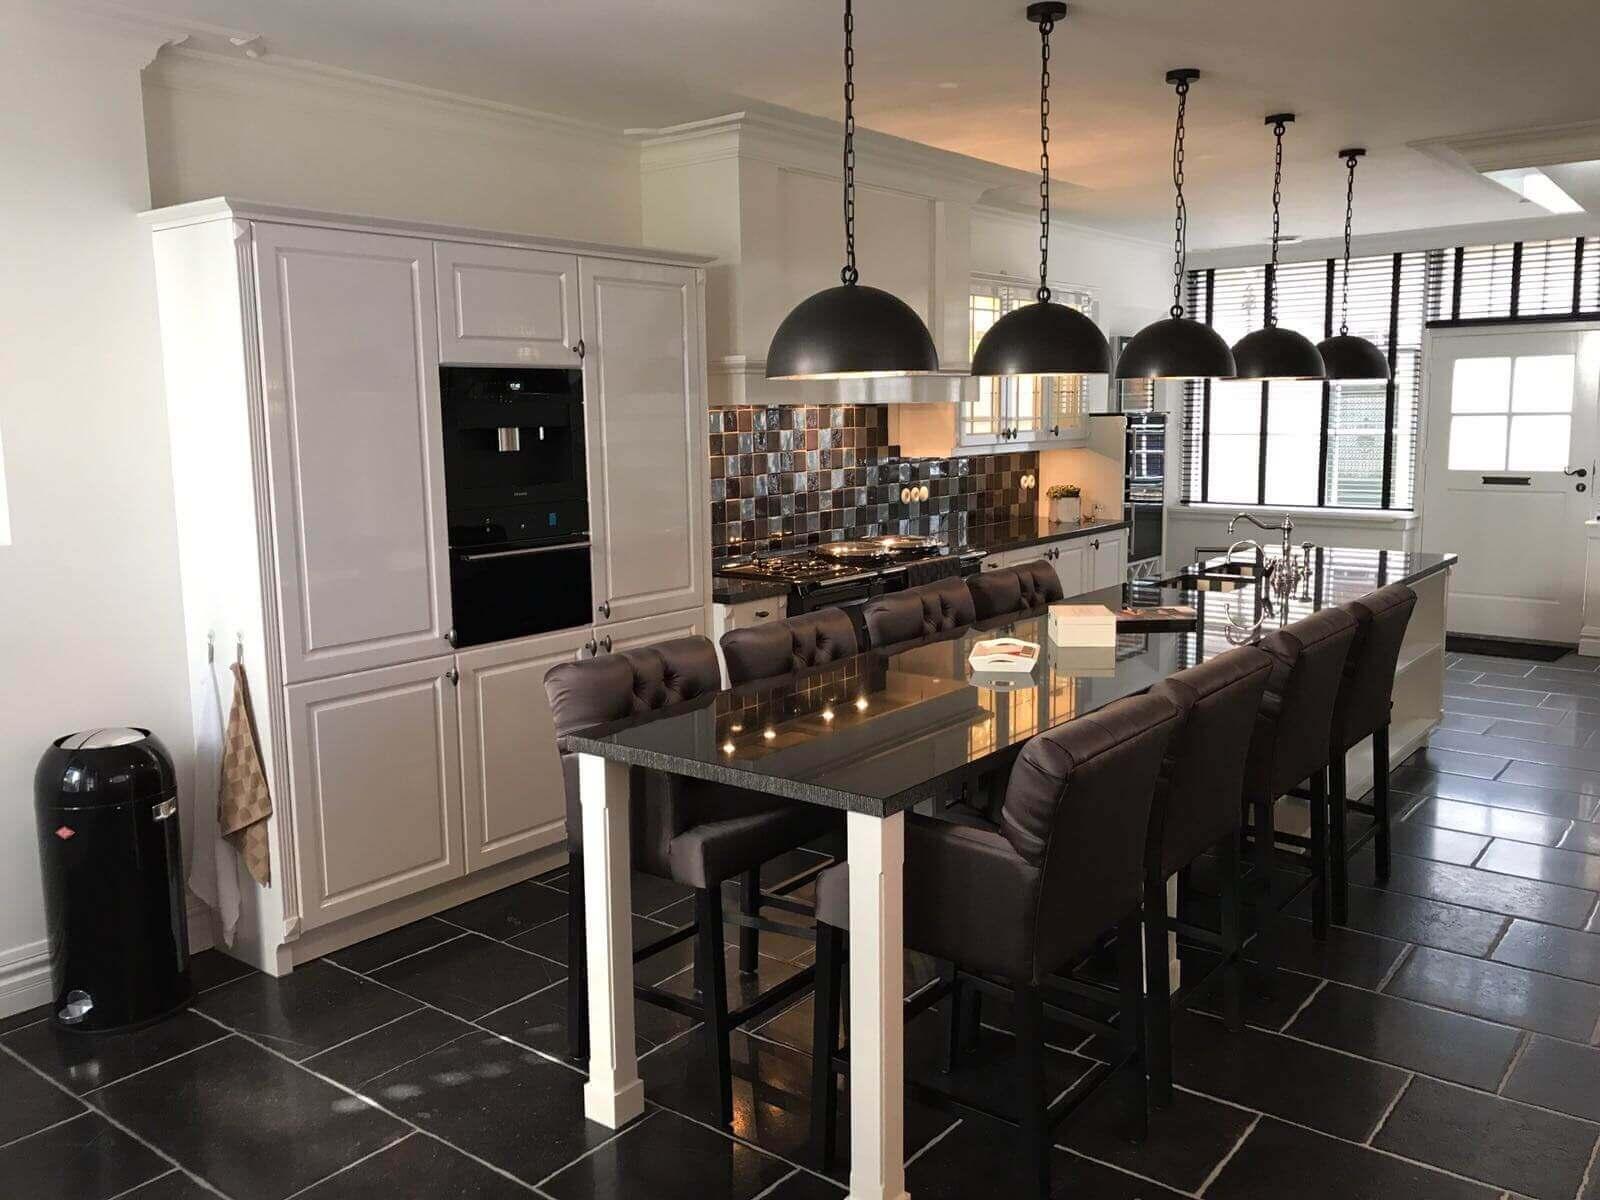 Grote keukens voor families